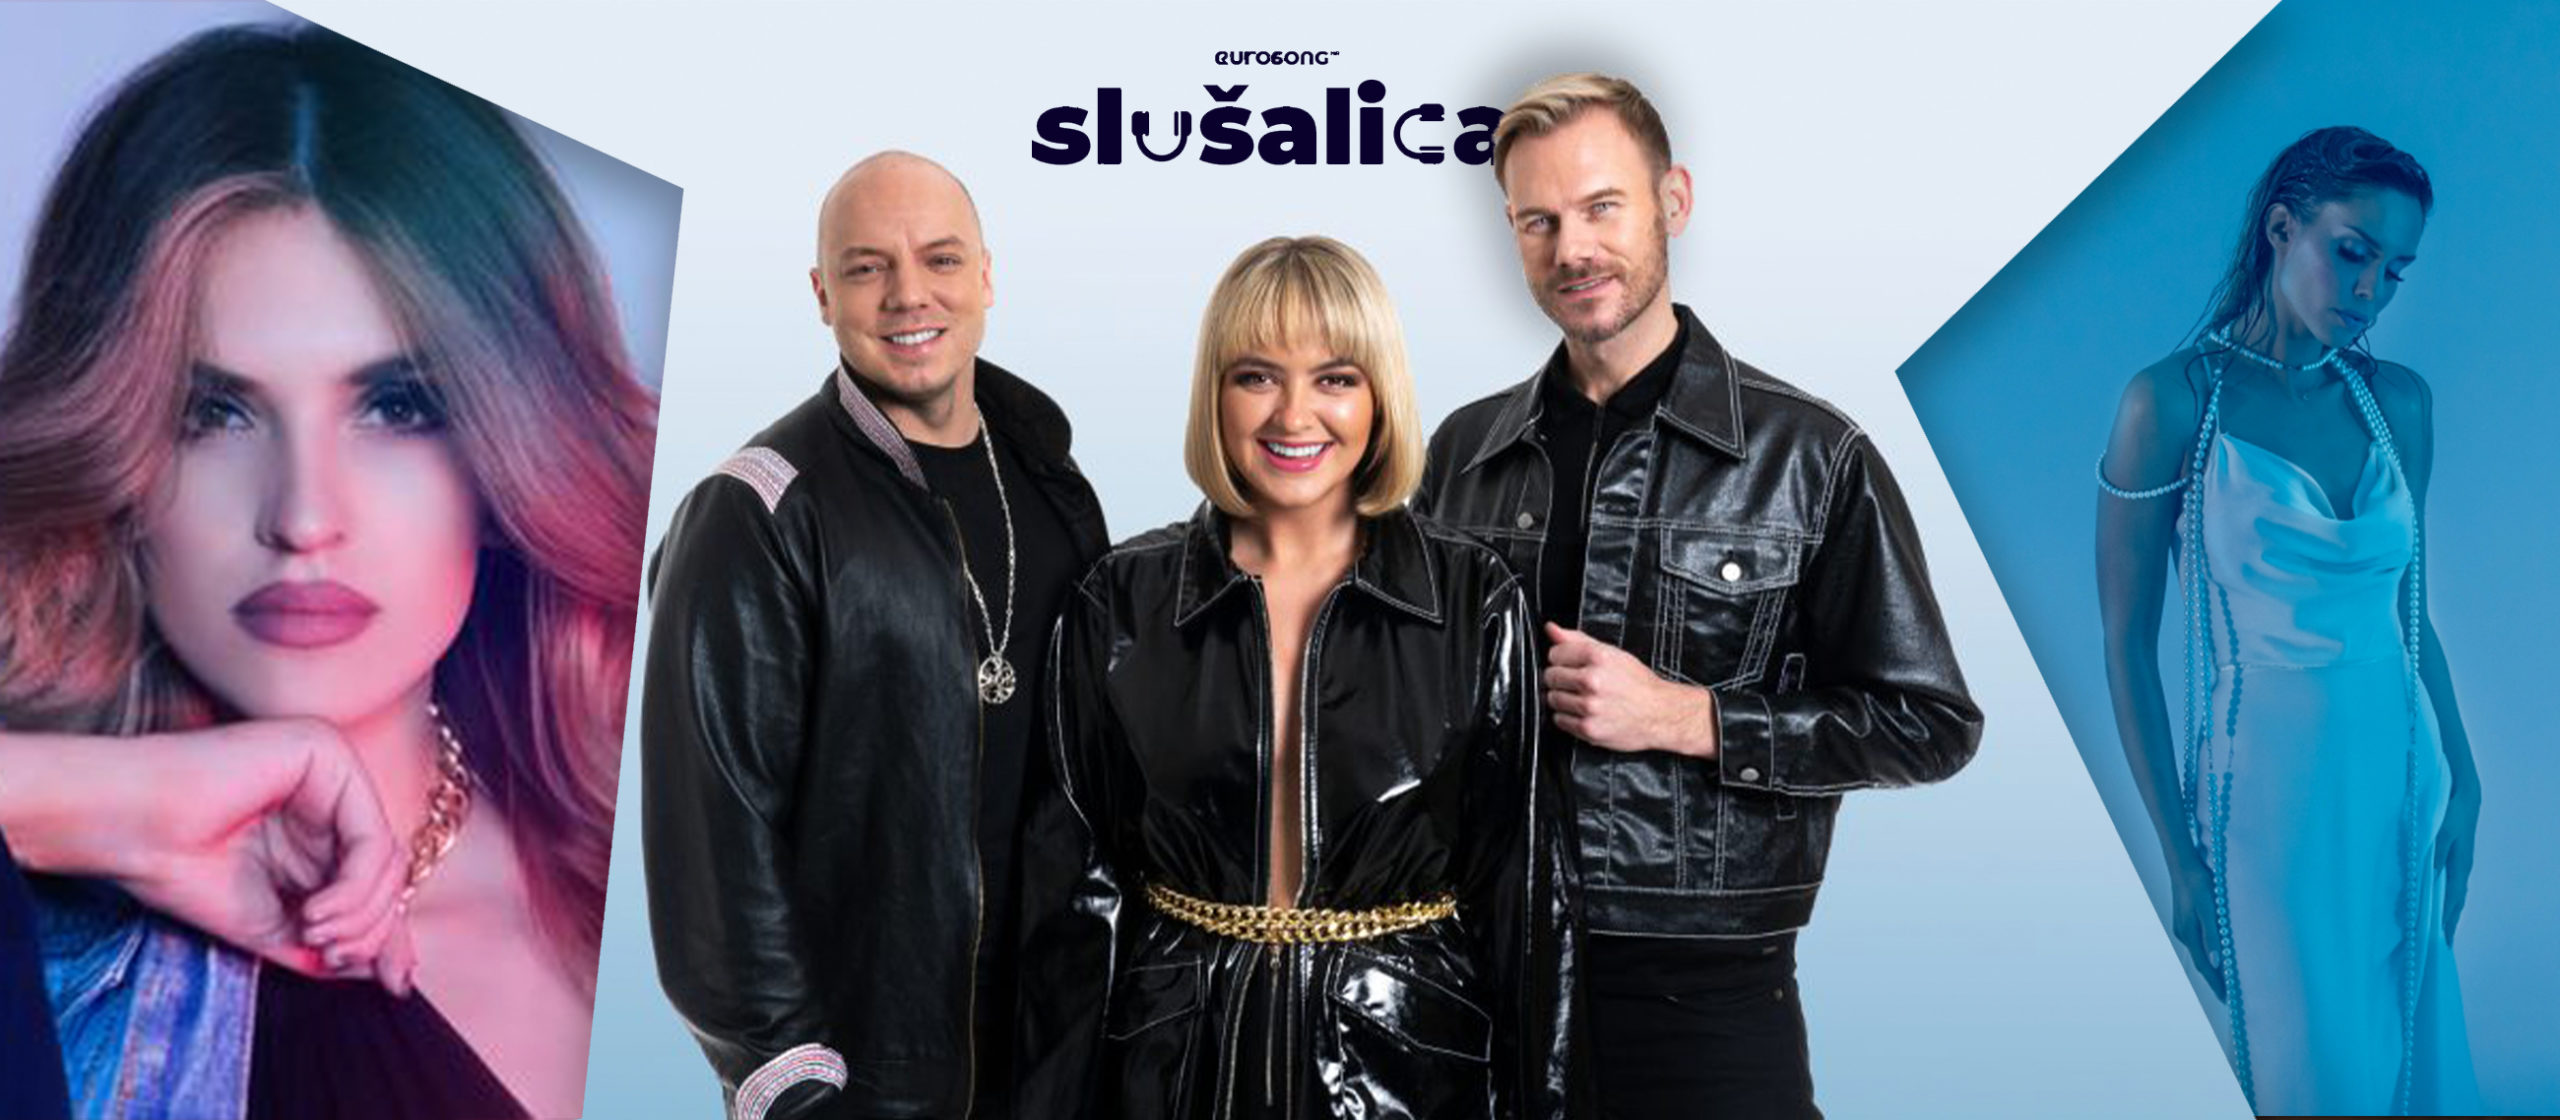 Eurosong Slušalica vizual za strani i domaći hit ožujka/marta 2021, Colonia, Franka i Keiino